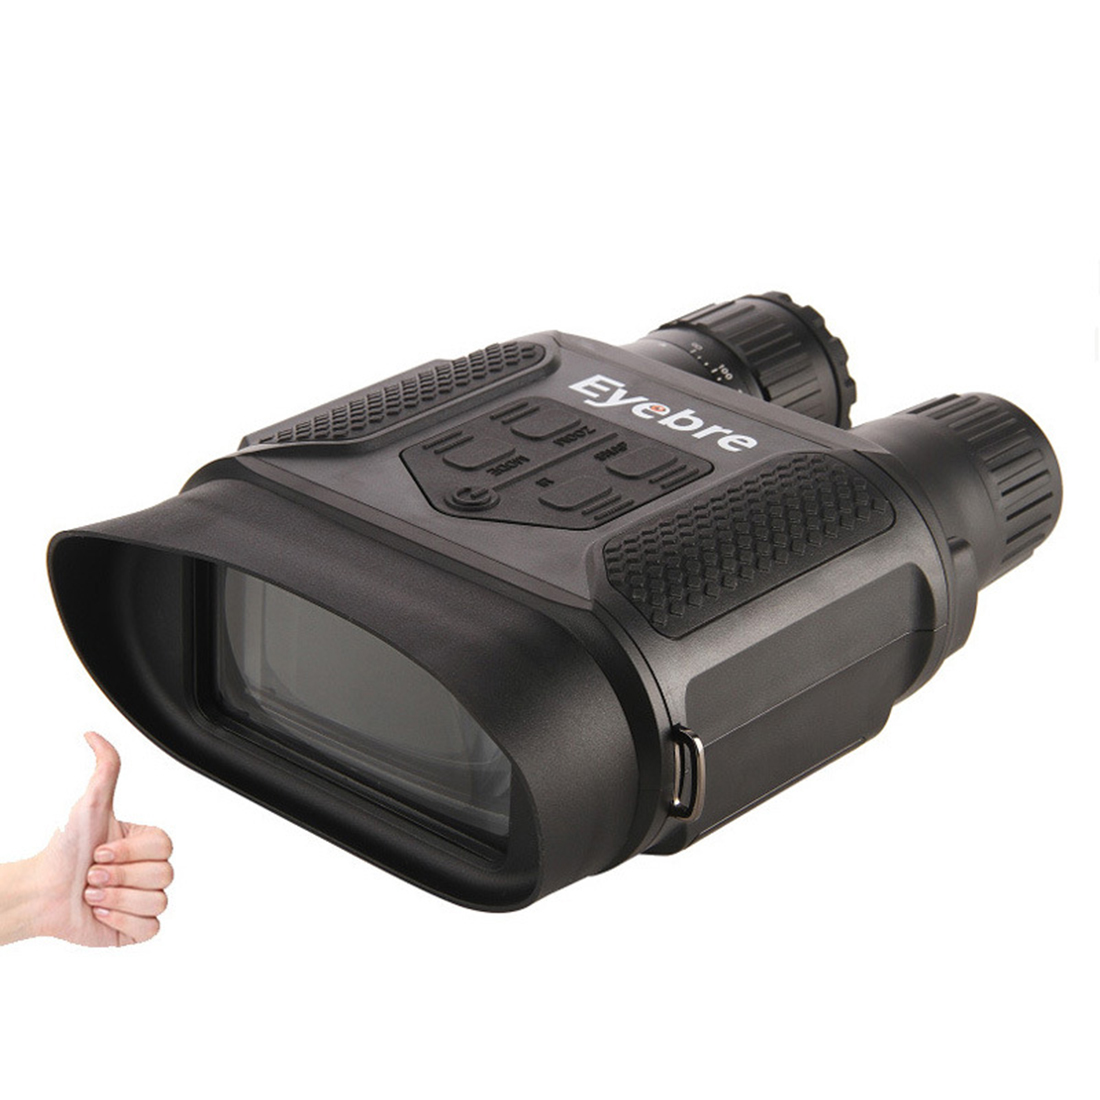 Eyebre HD Large Screen Night Vision Digital Binoculars Night Vision Device - Black